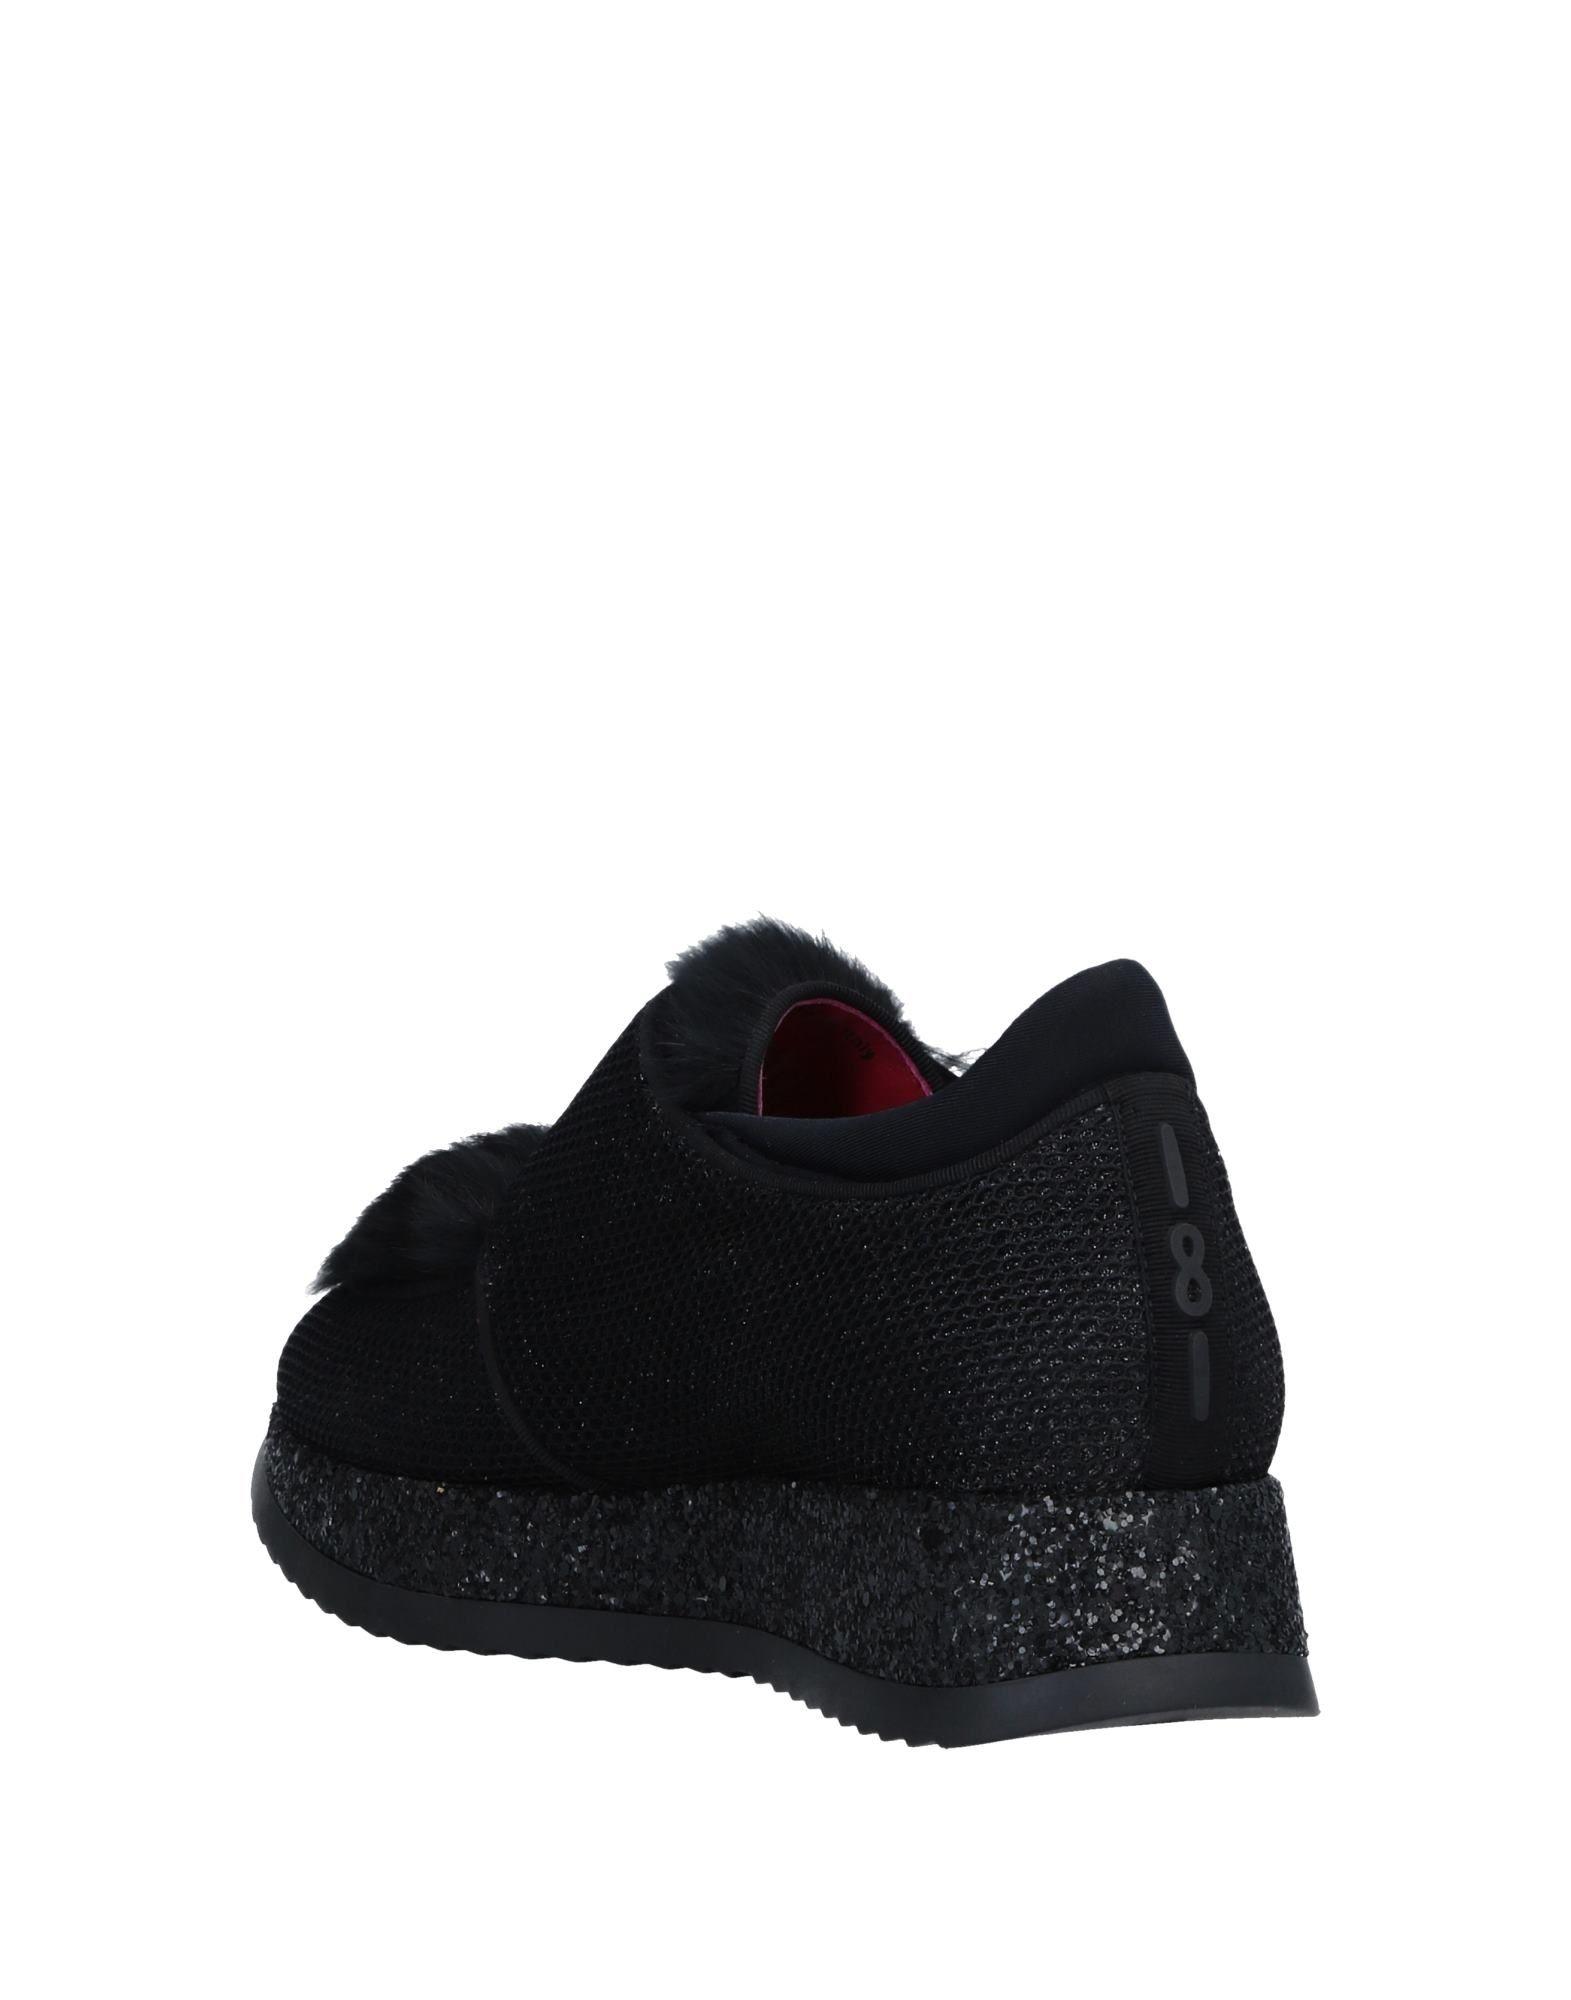 Stilvolle billige Schuhe 181 By Alberto Gozzi Sneakers Sneakers Sneakers Damen  11536256HG 2bfe52